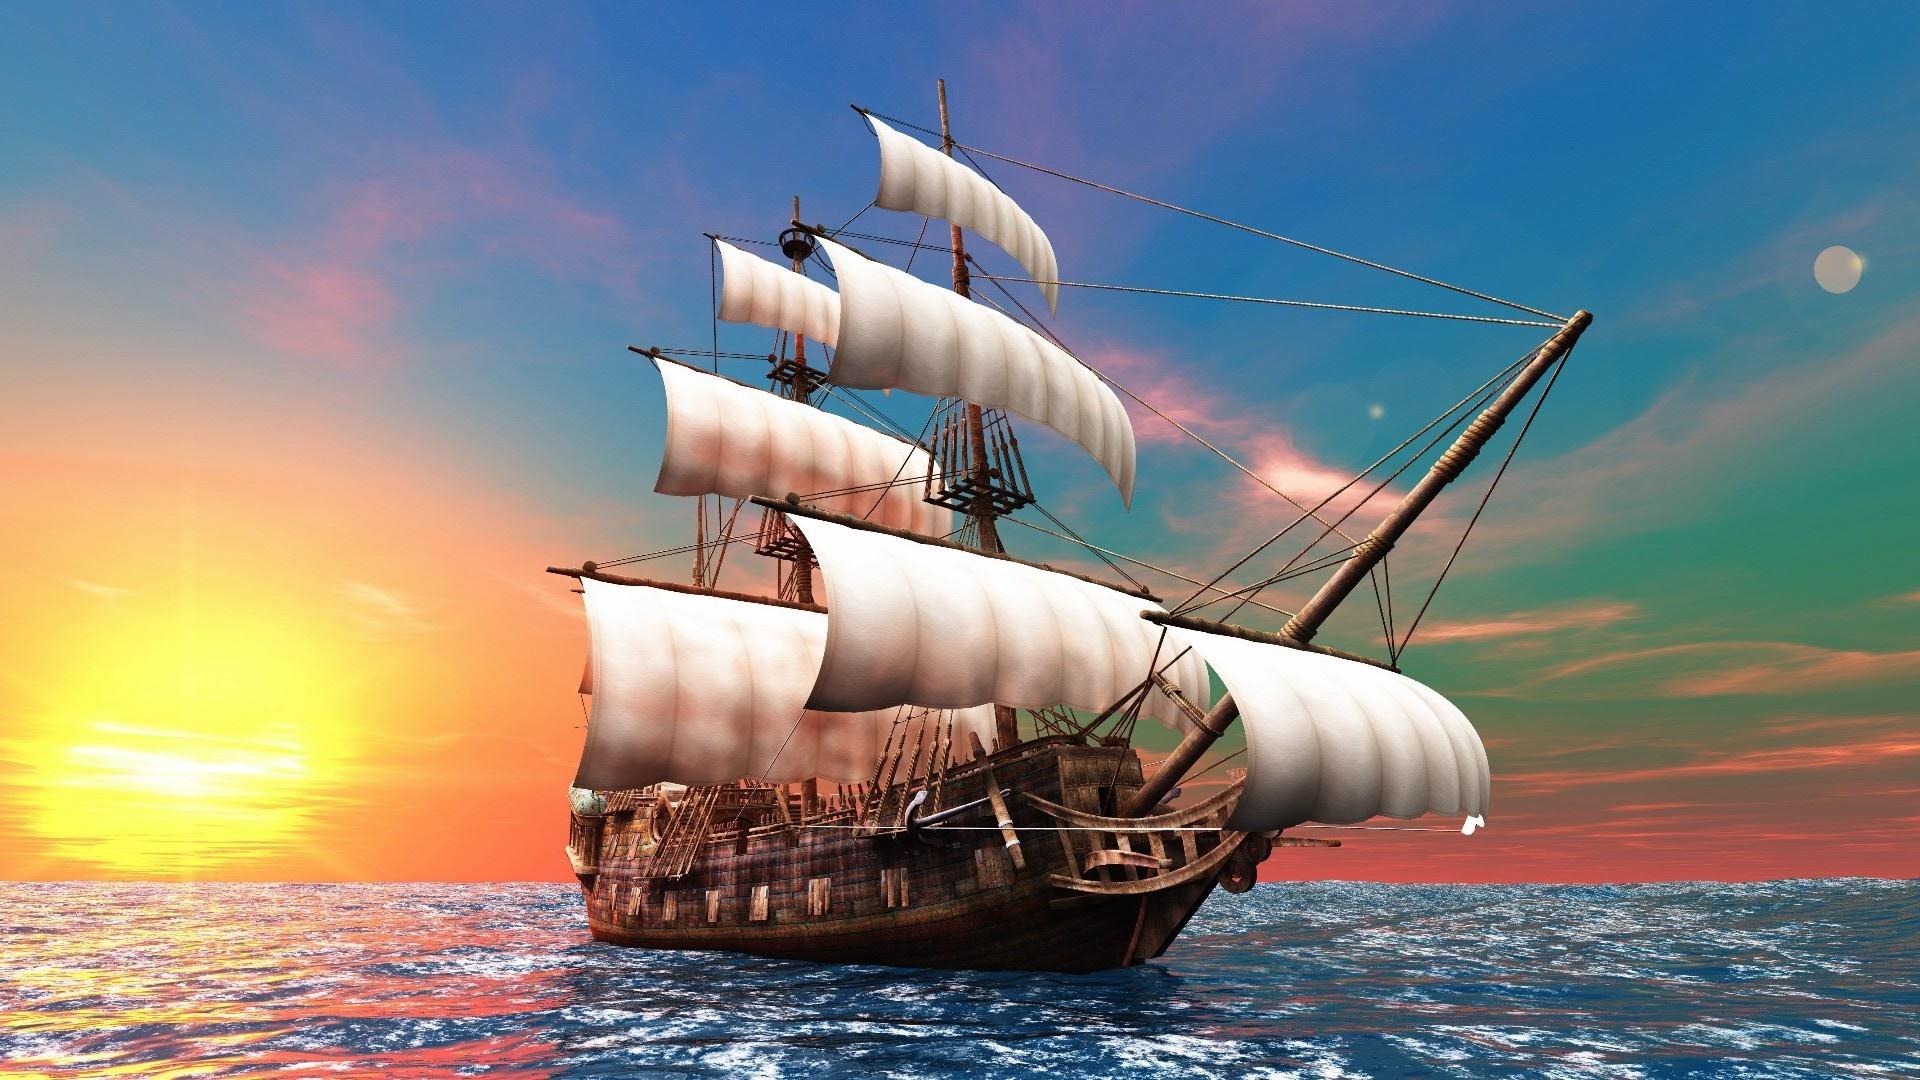 Картинка корабль на телефон обои